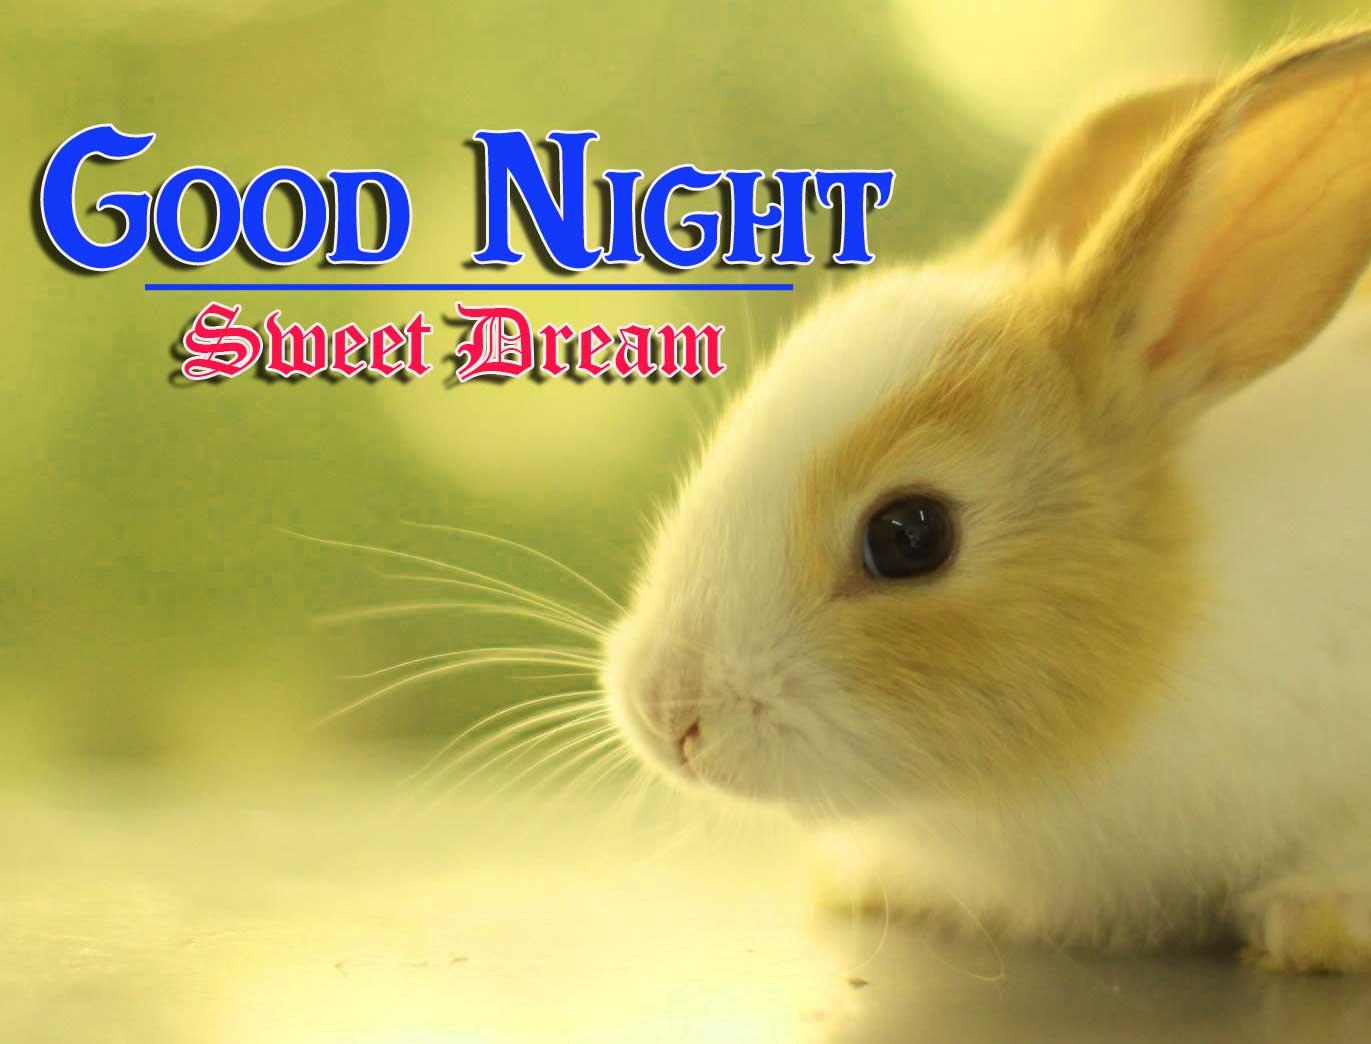 Beautiful Free Good Night Images 4k 1080p Wallpaper for Whatsapp